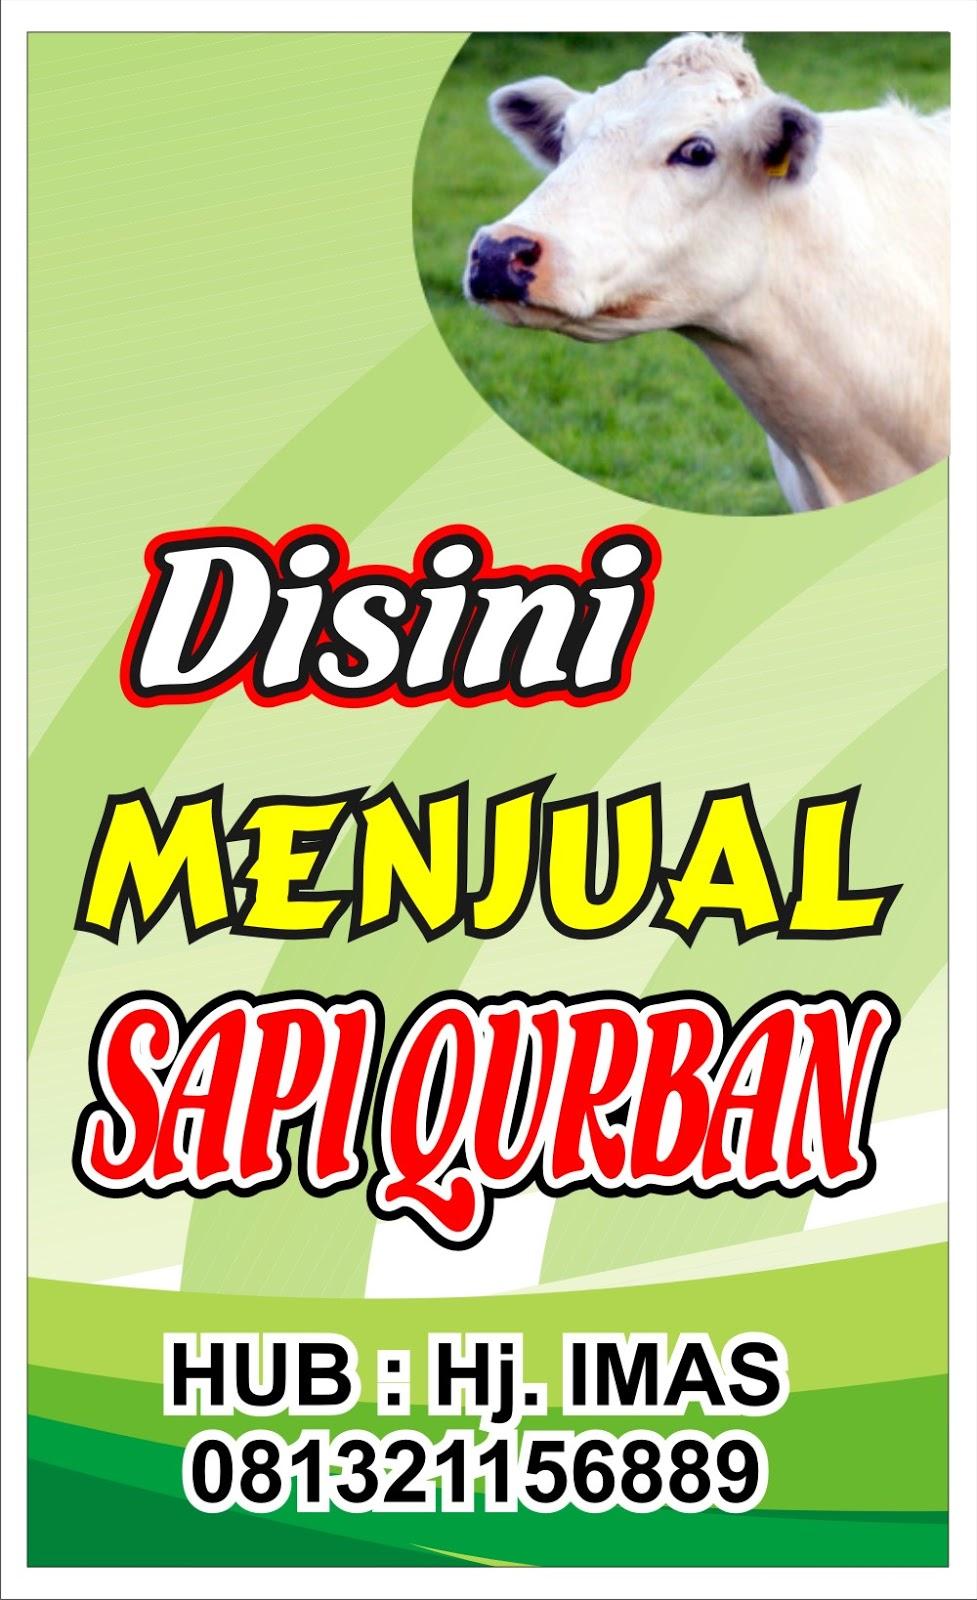 Download Contoh Spanduk Jual Hewan Qurban.cdr - KARYAKU